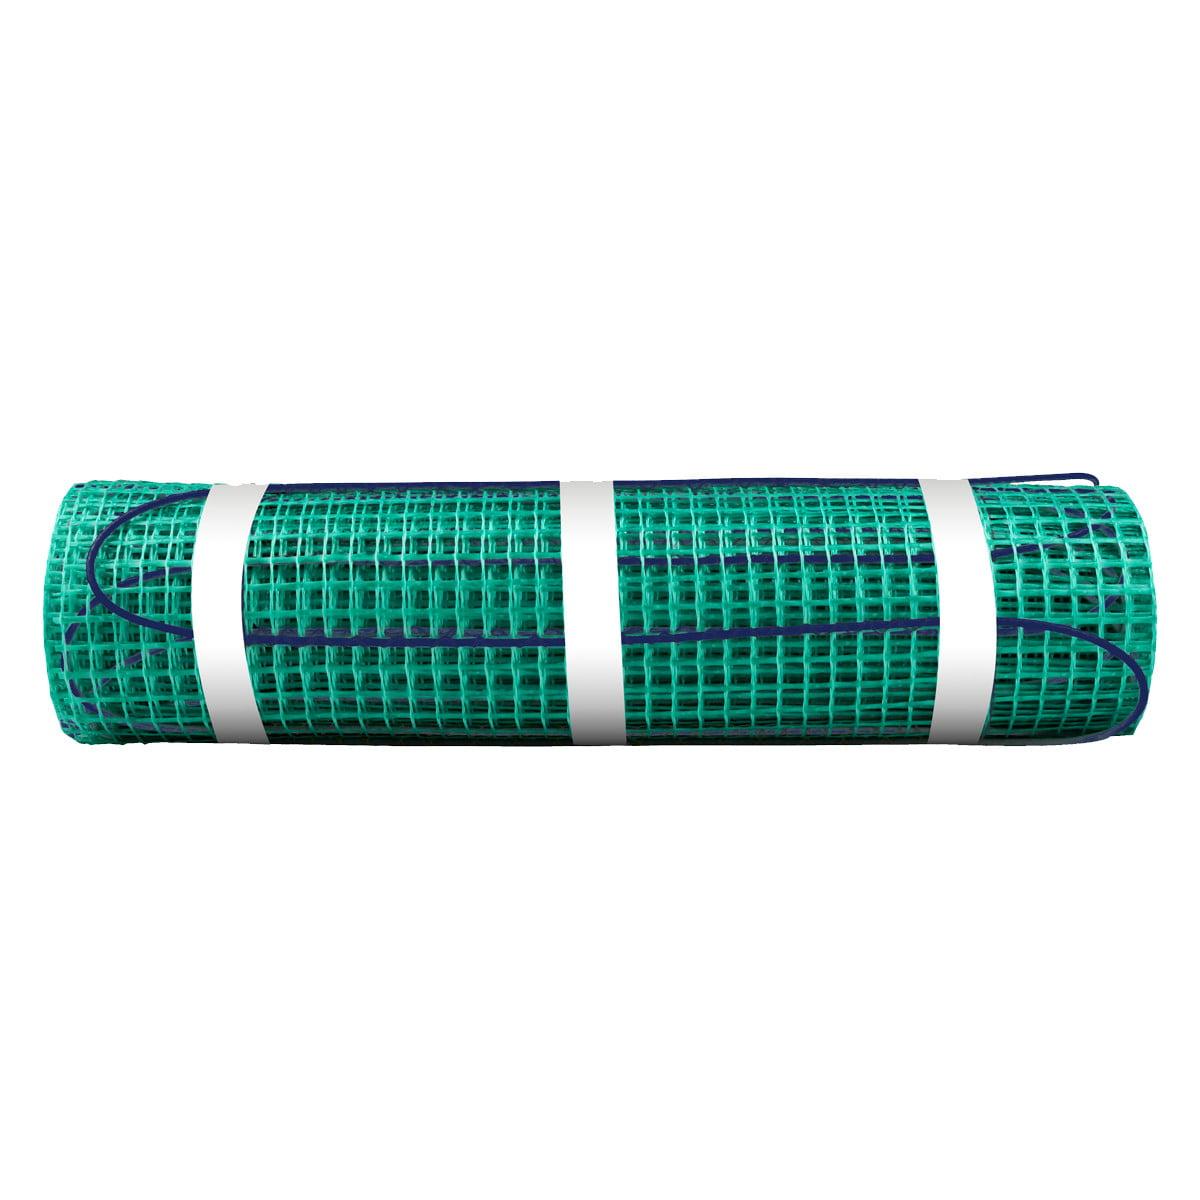 WarmlyYours TRT240-1.5x08 TempZone 240V 0.8A 1.5 Foot x 8 Foot Flex Roll